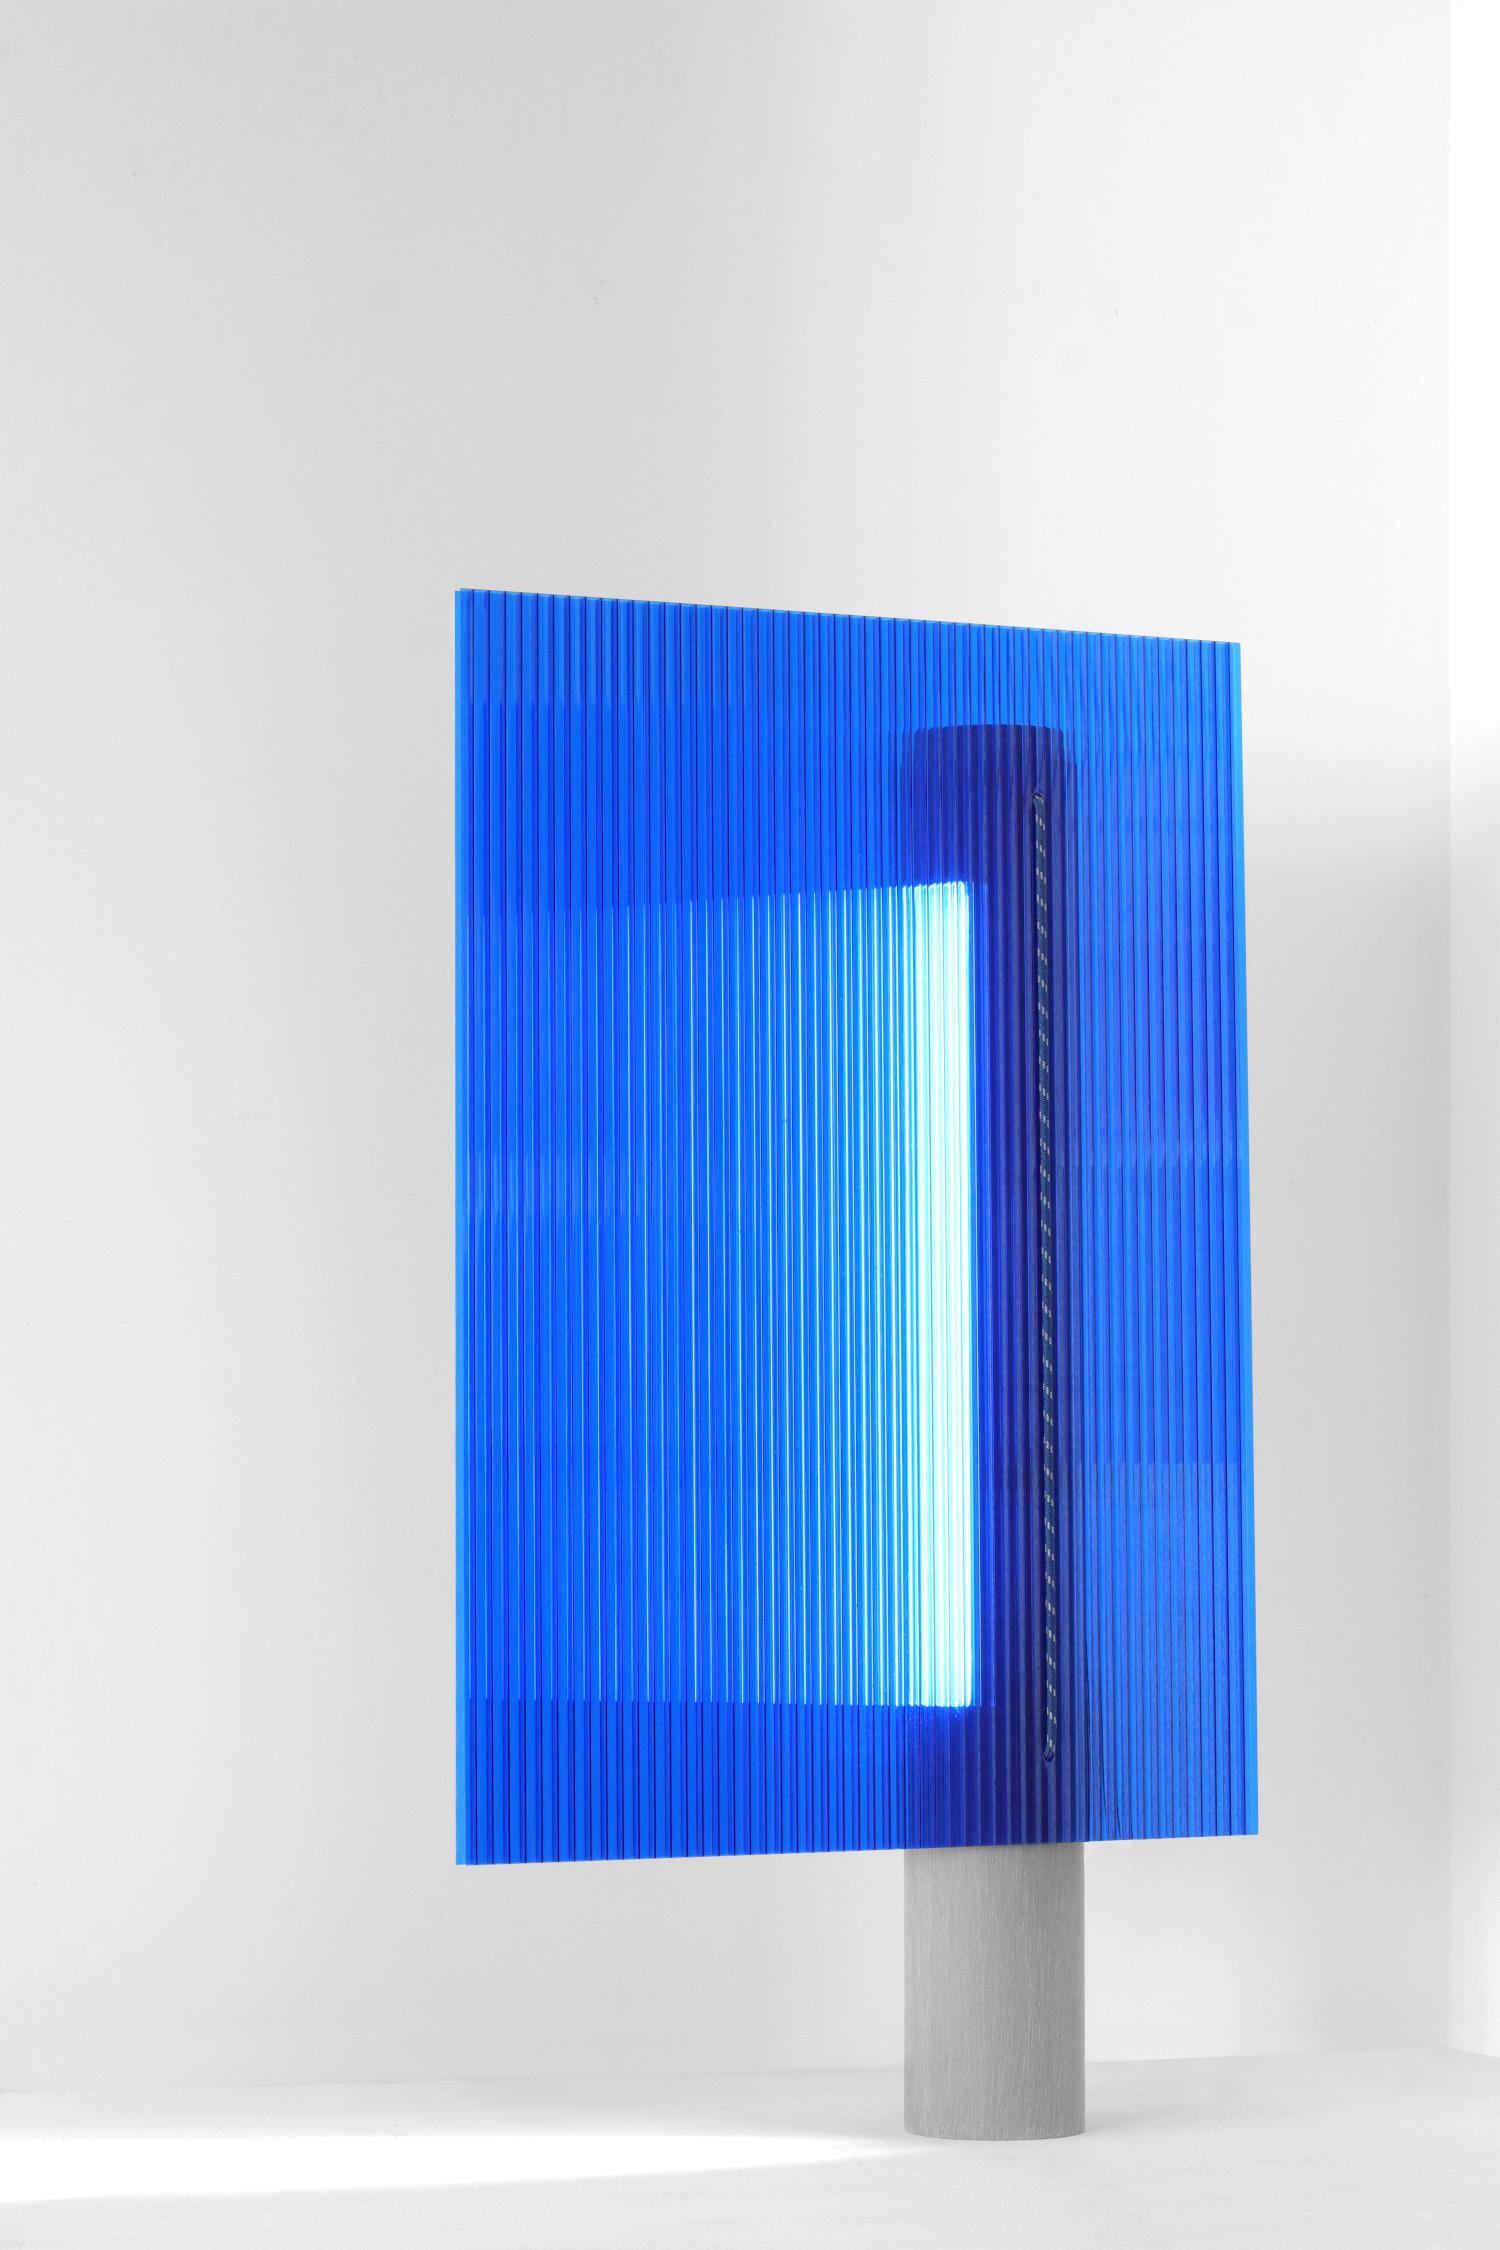 Gradient blue lamp_flavien delbergue_©flavien delbergue